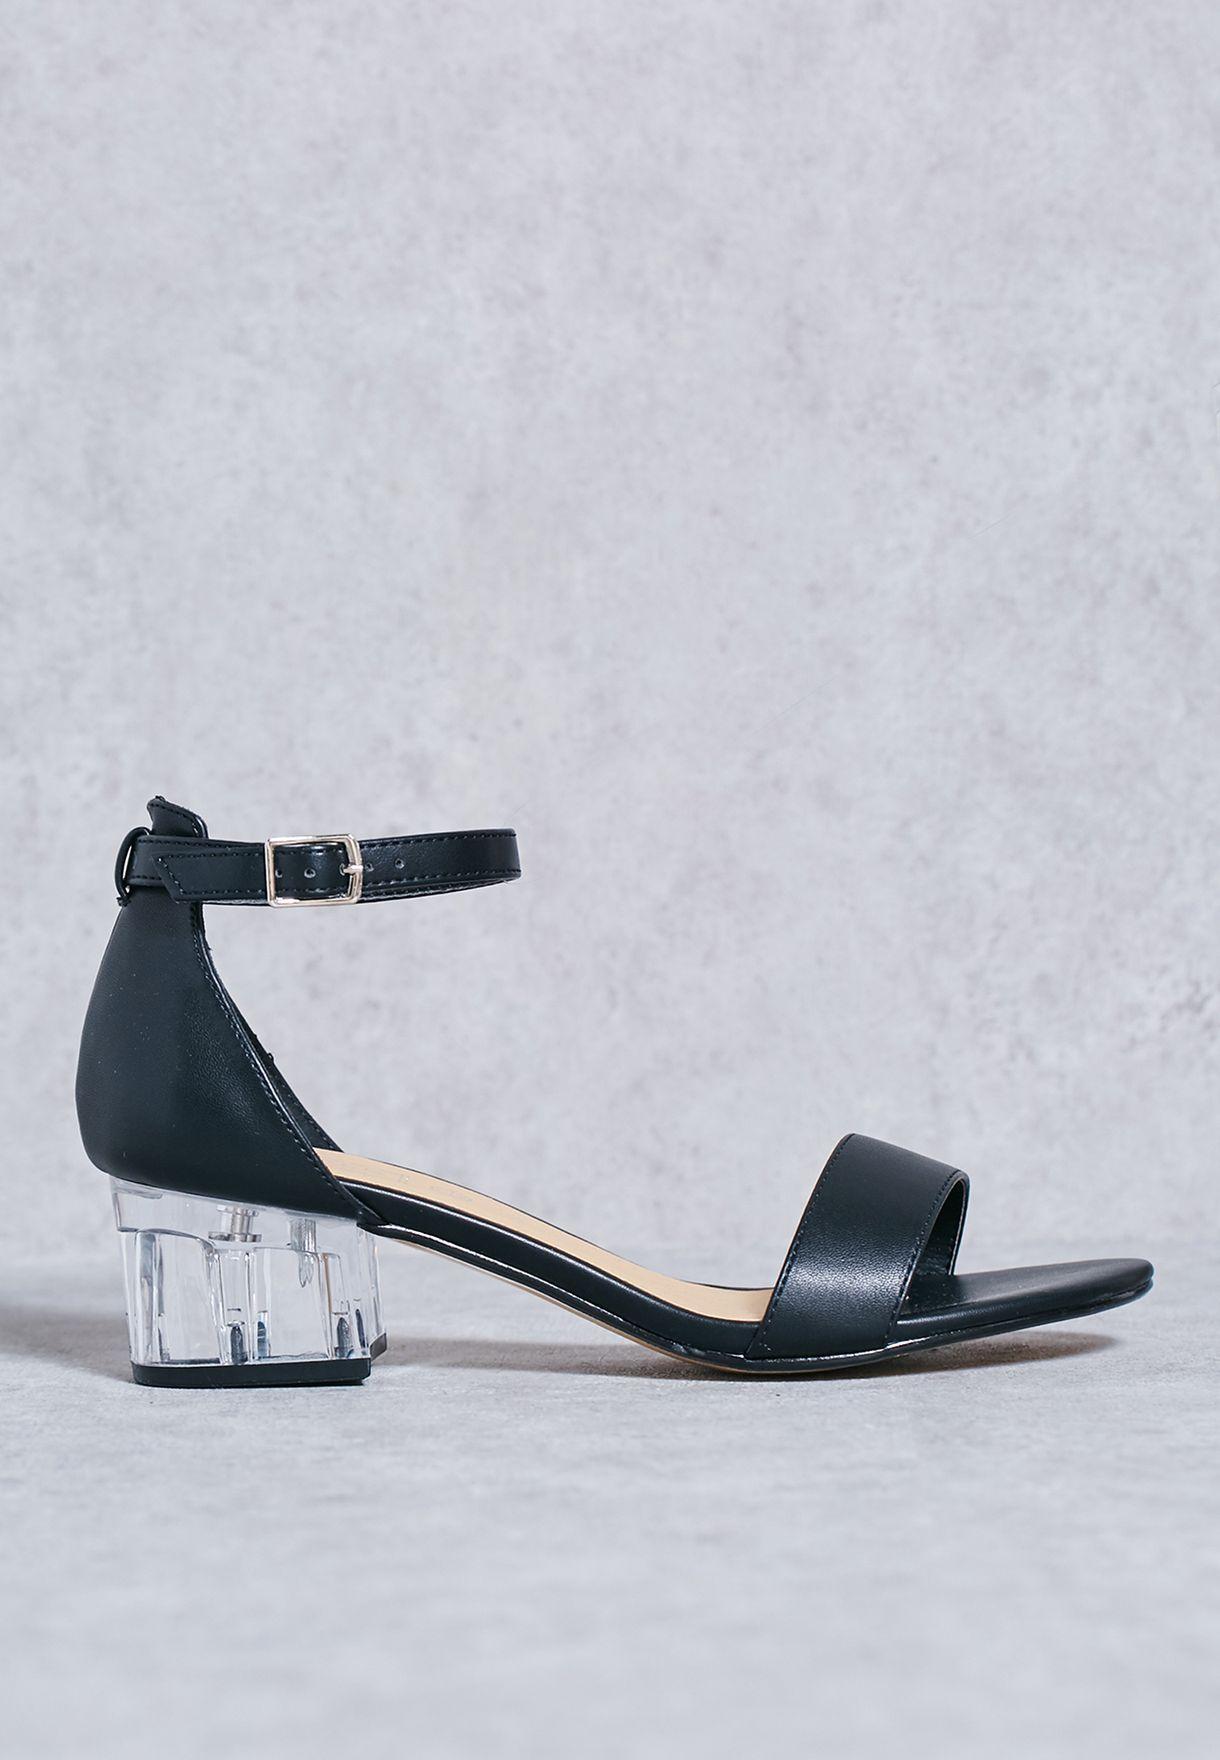 a4a7c4628430 Shop Truffle black Two Part Block Heel Sandals for Women in UAE ...